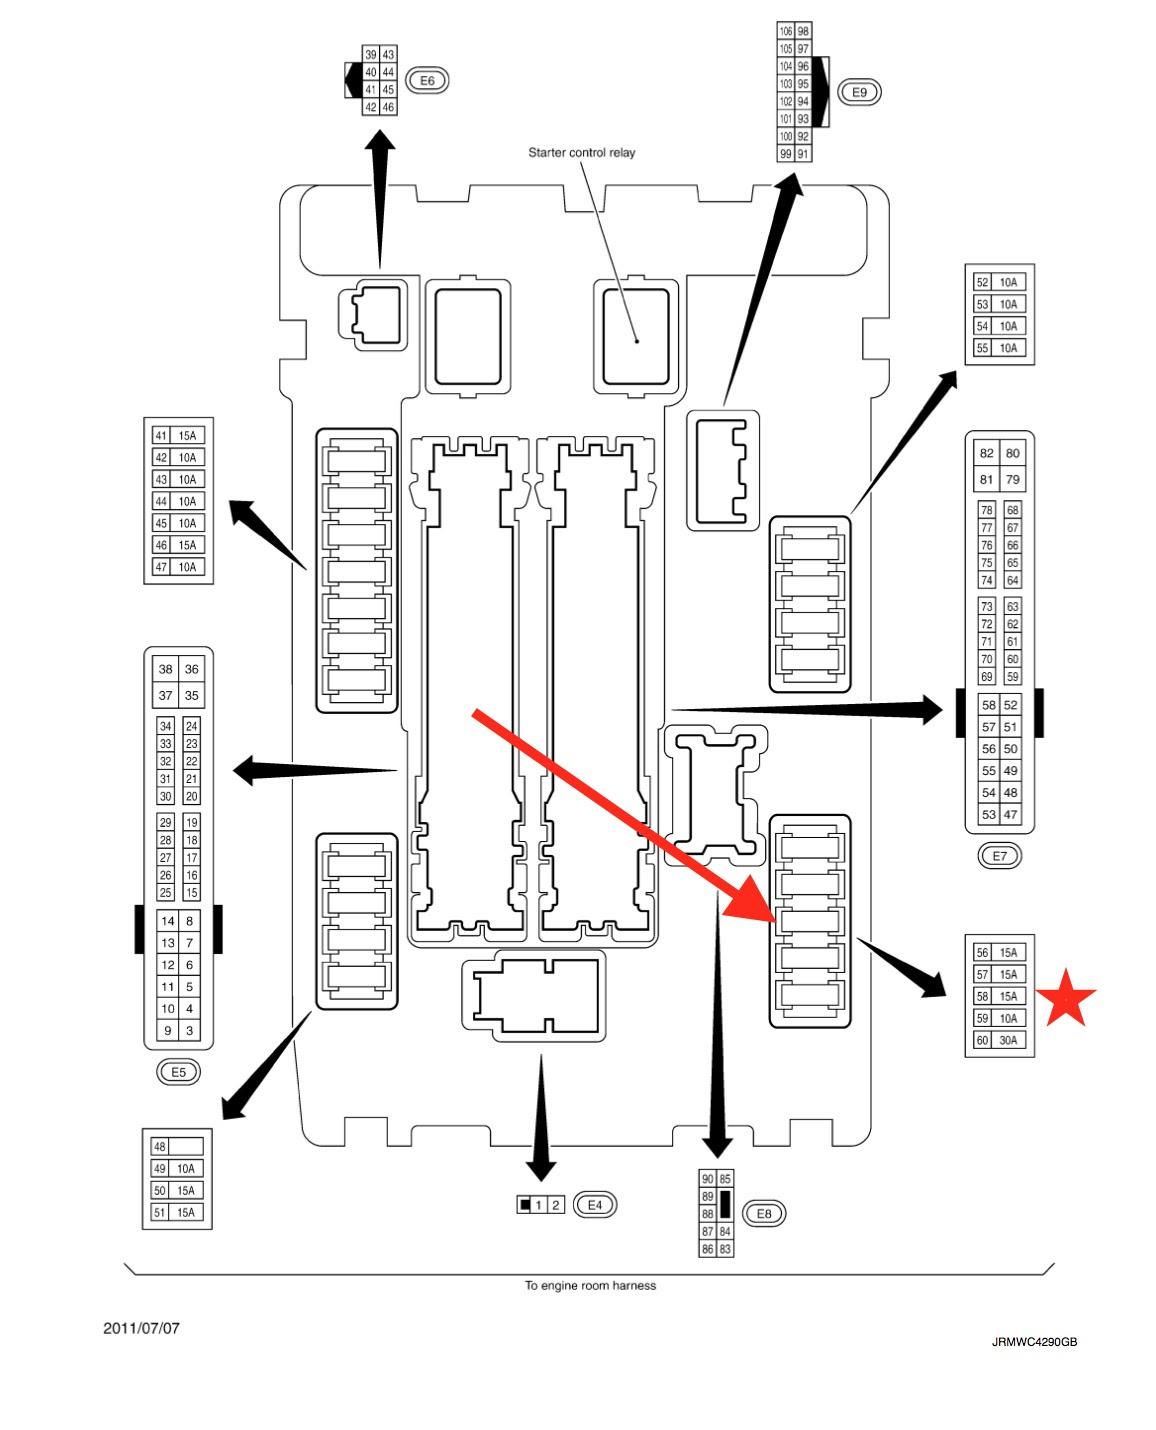 F09 2005 Mercury Montego Fuse Box Diagram Wiring Resources